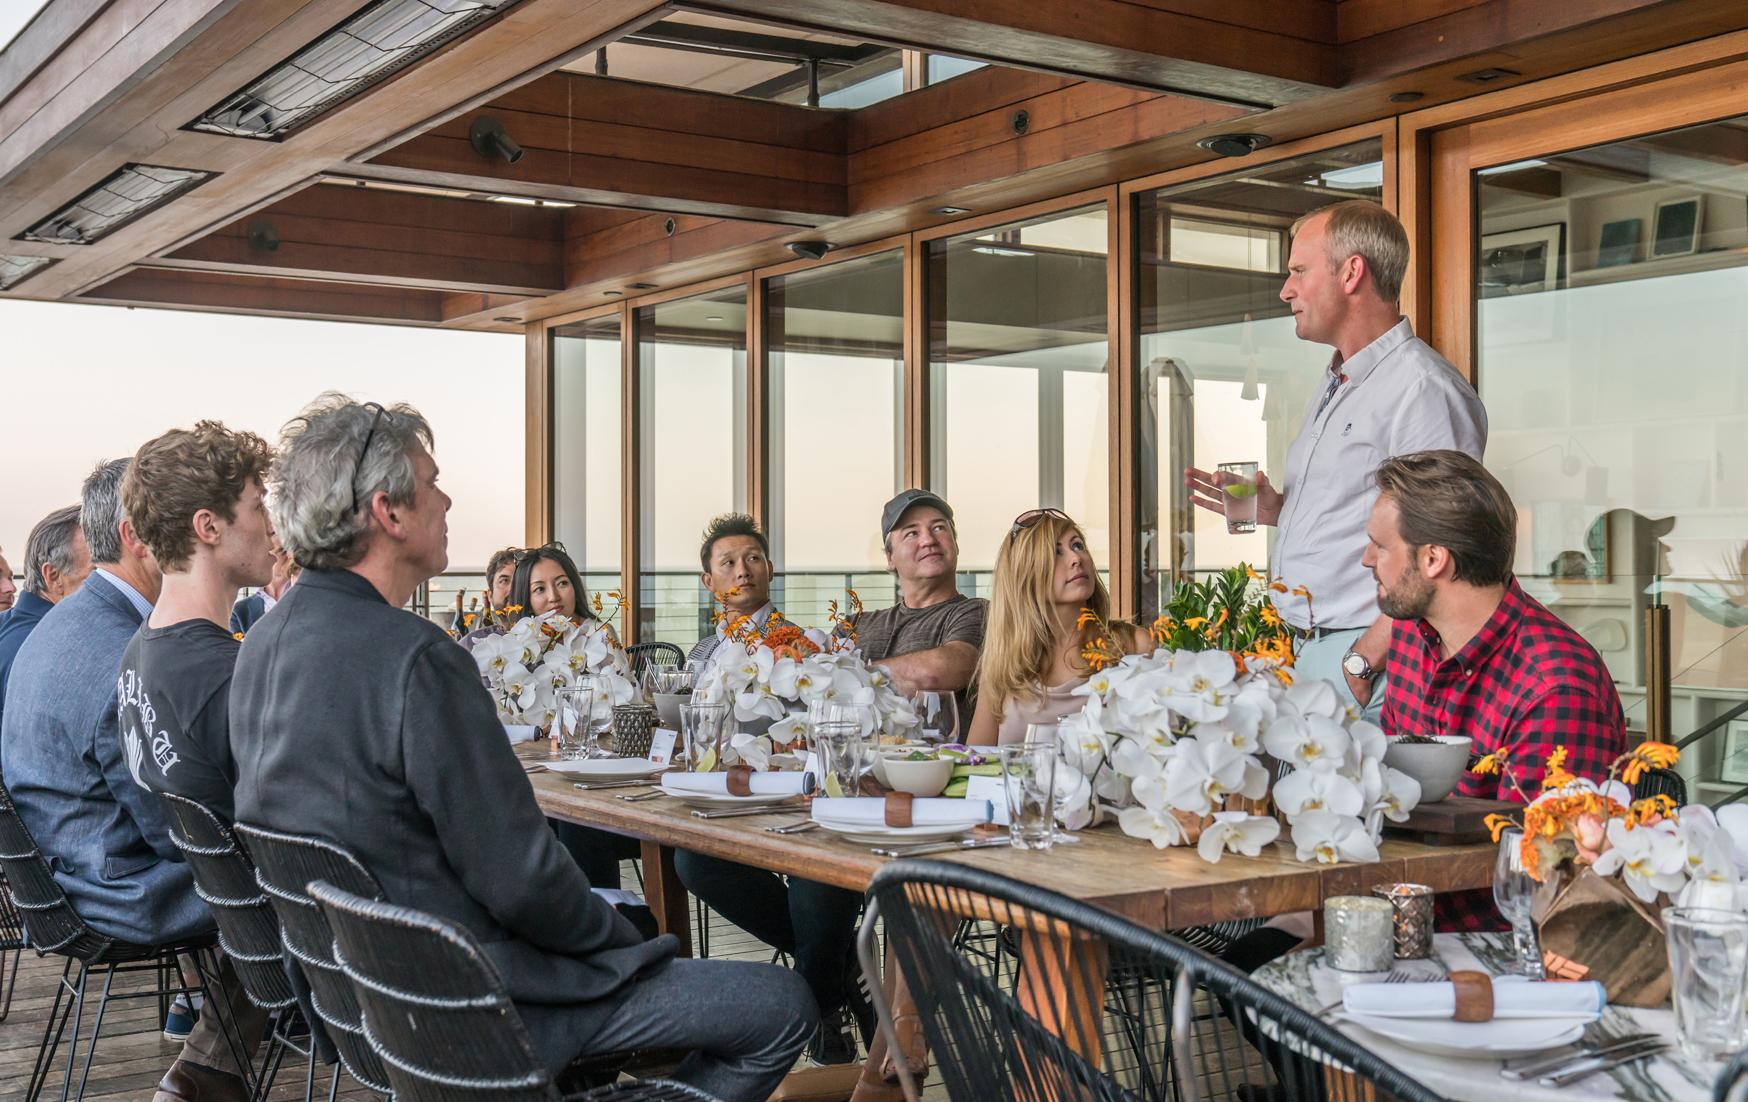 McLaren-Soho-Malibu-MSO-DInner-3, McLaren dinner at Soho Malibu, McLaren Beverly Hills, O'Gara Coach Beverly Hills,